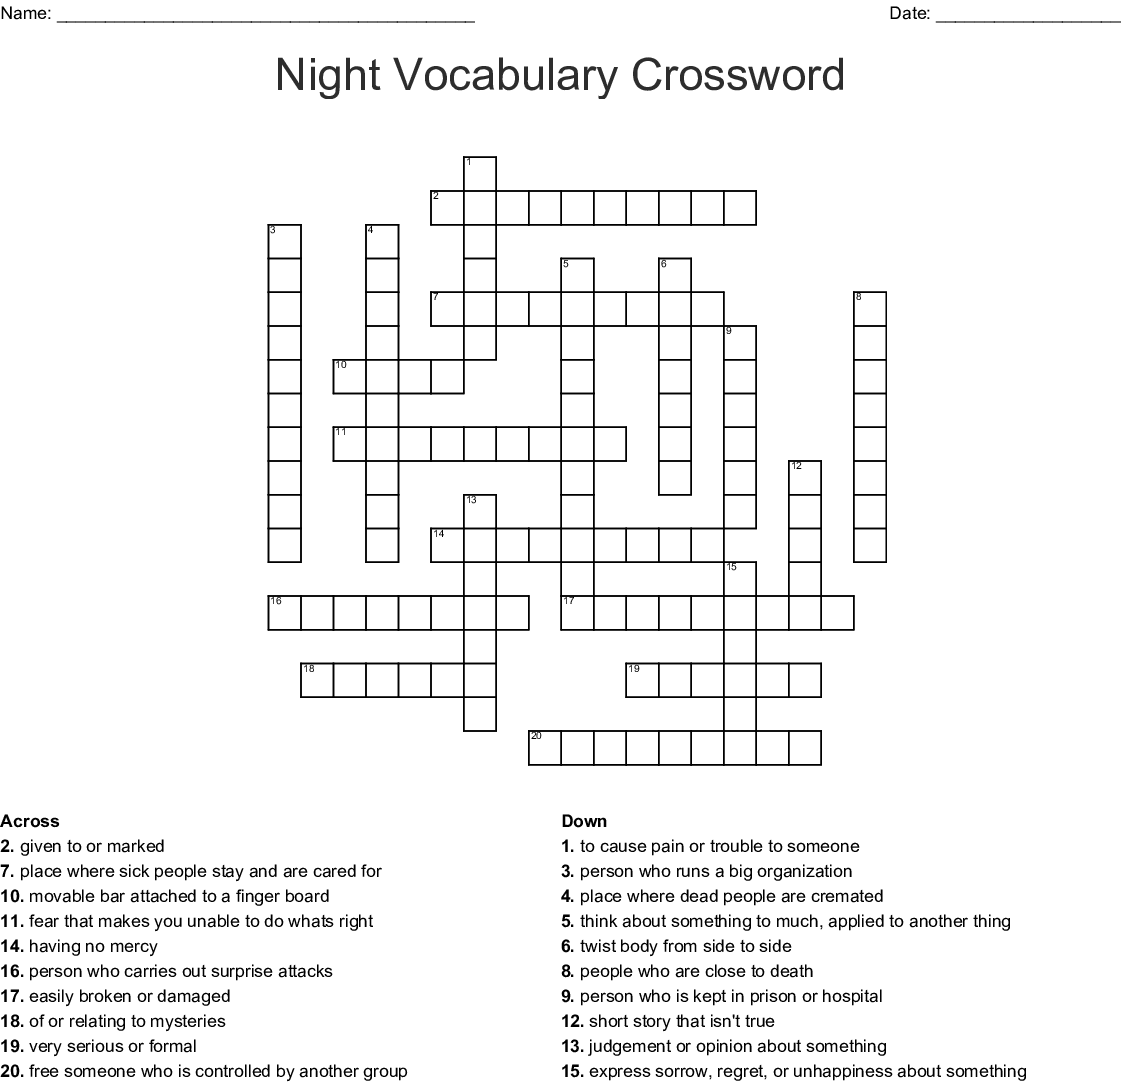 Night Vocabulary Crossword